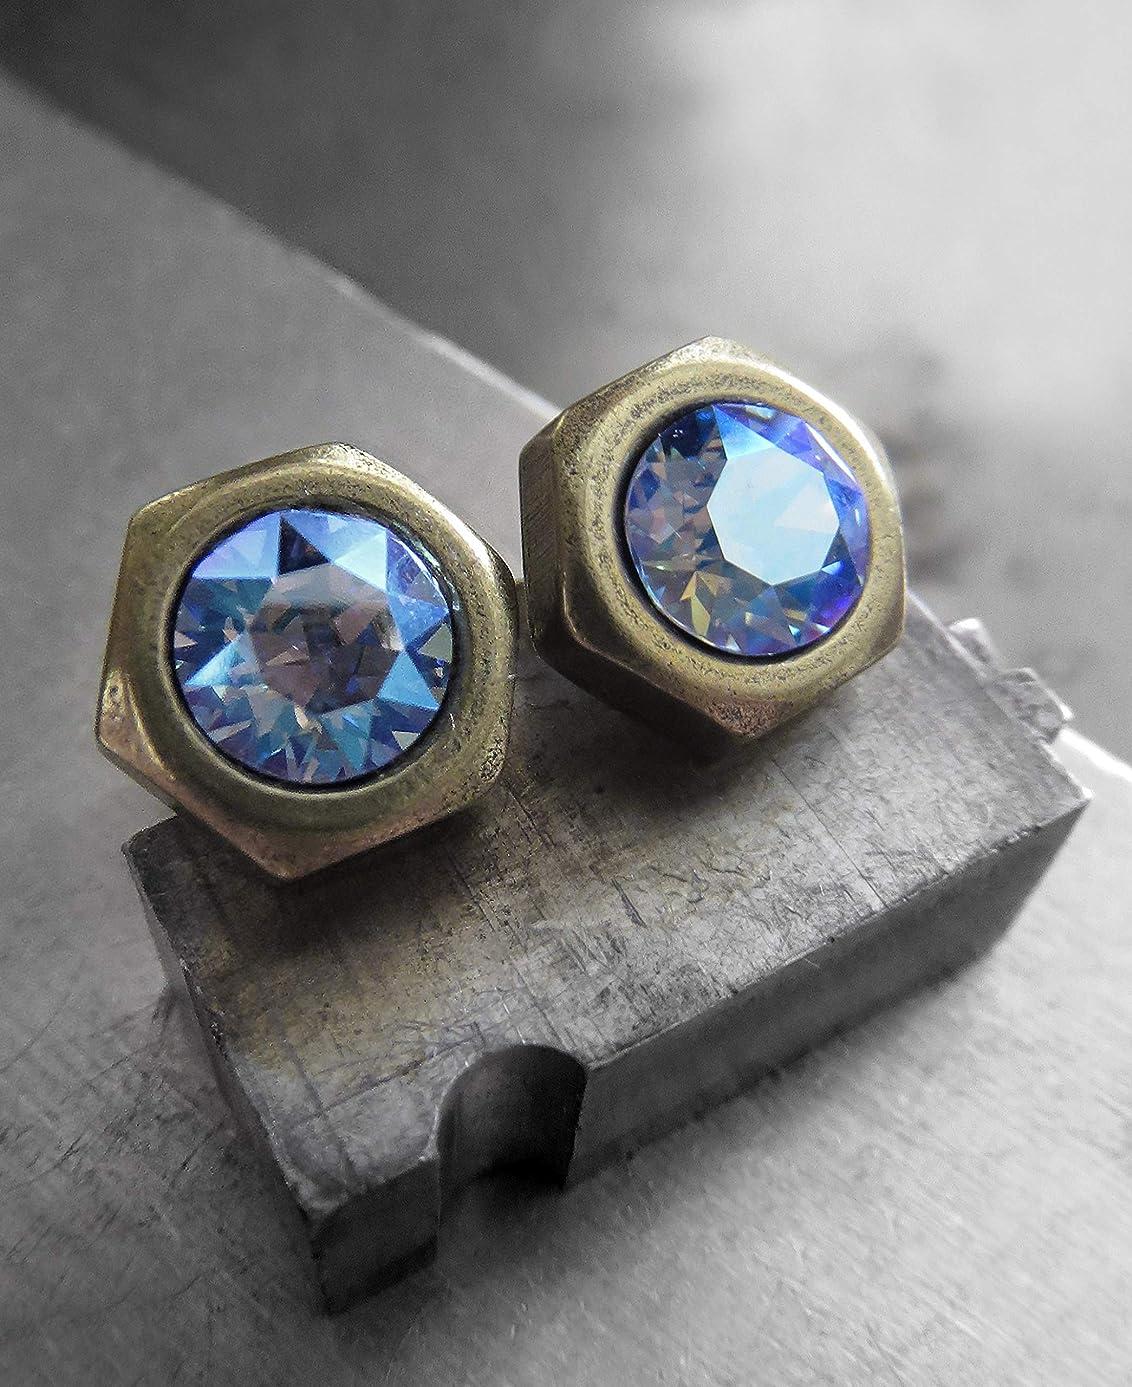 Mens Hex Nut Stud Earrings with Blue Swarovski Crystal - Unisex Hardware Jewelry